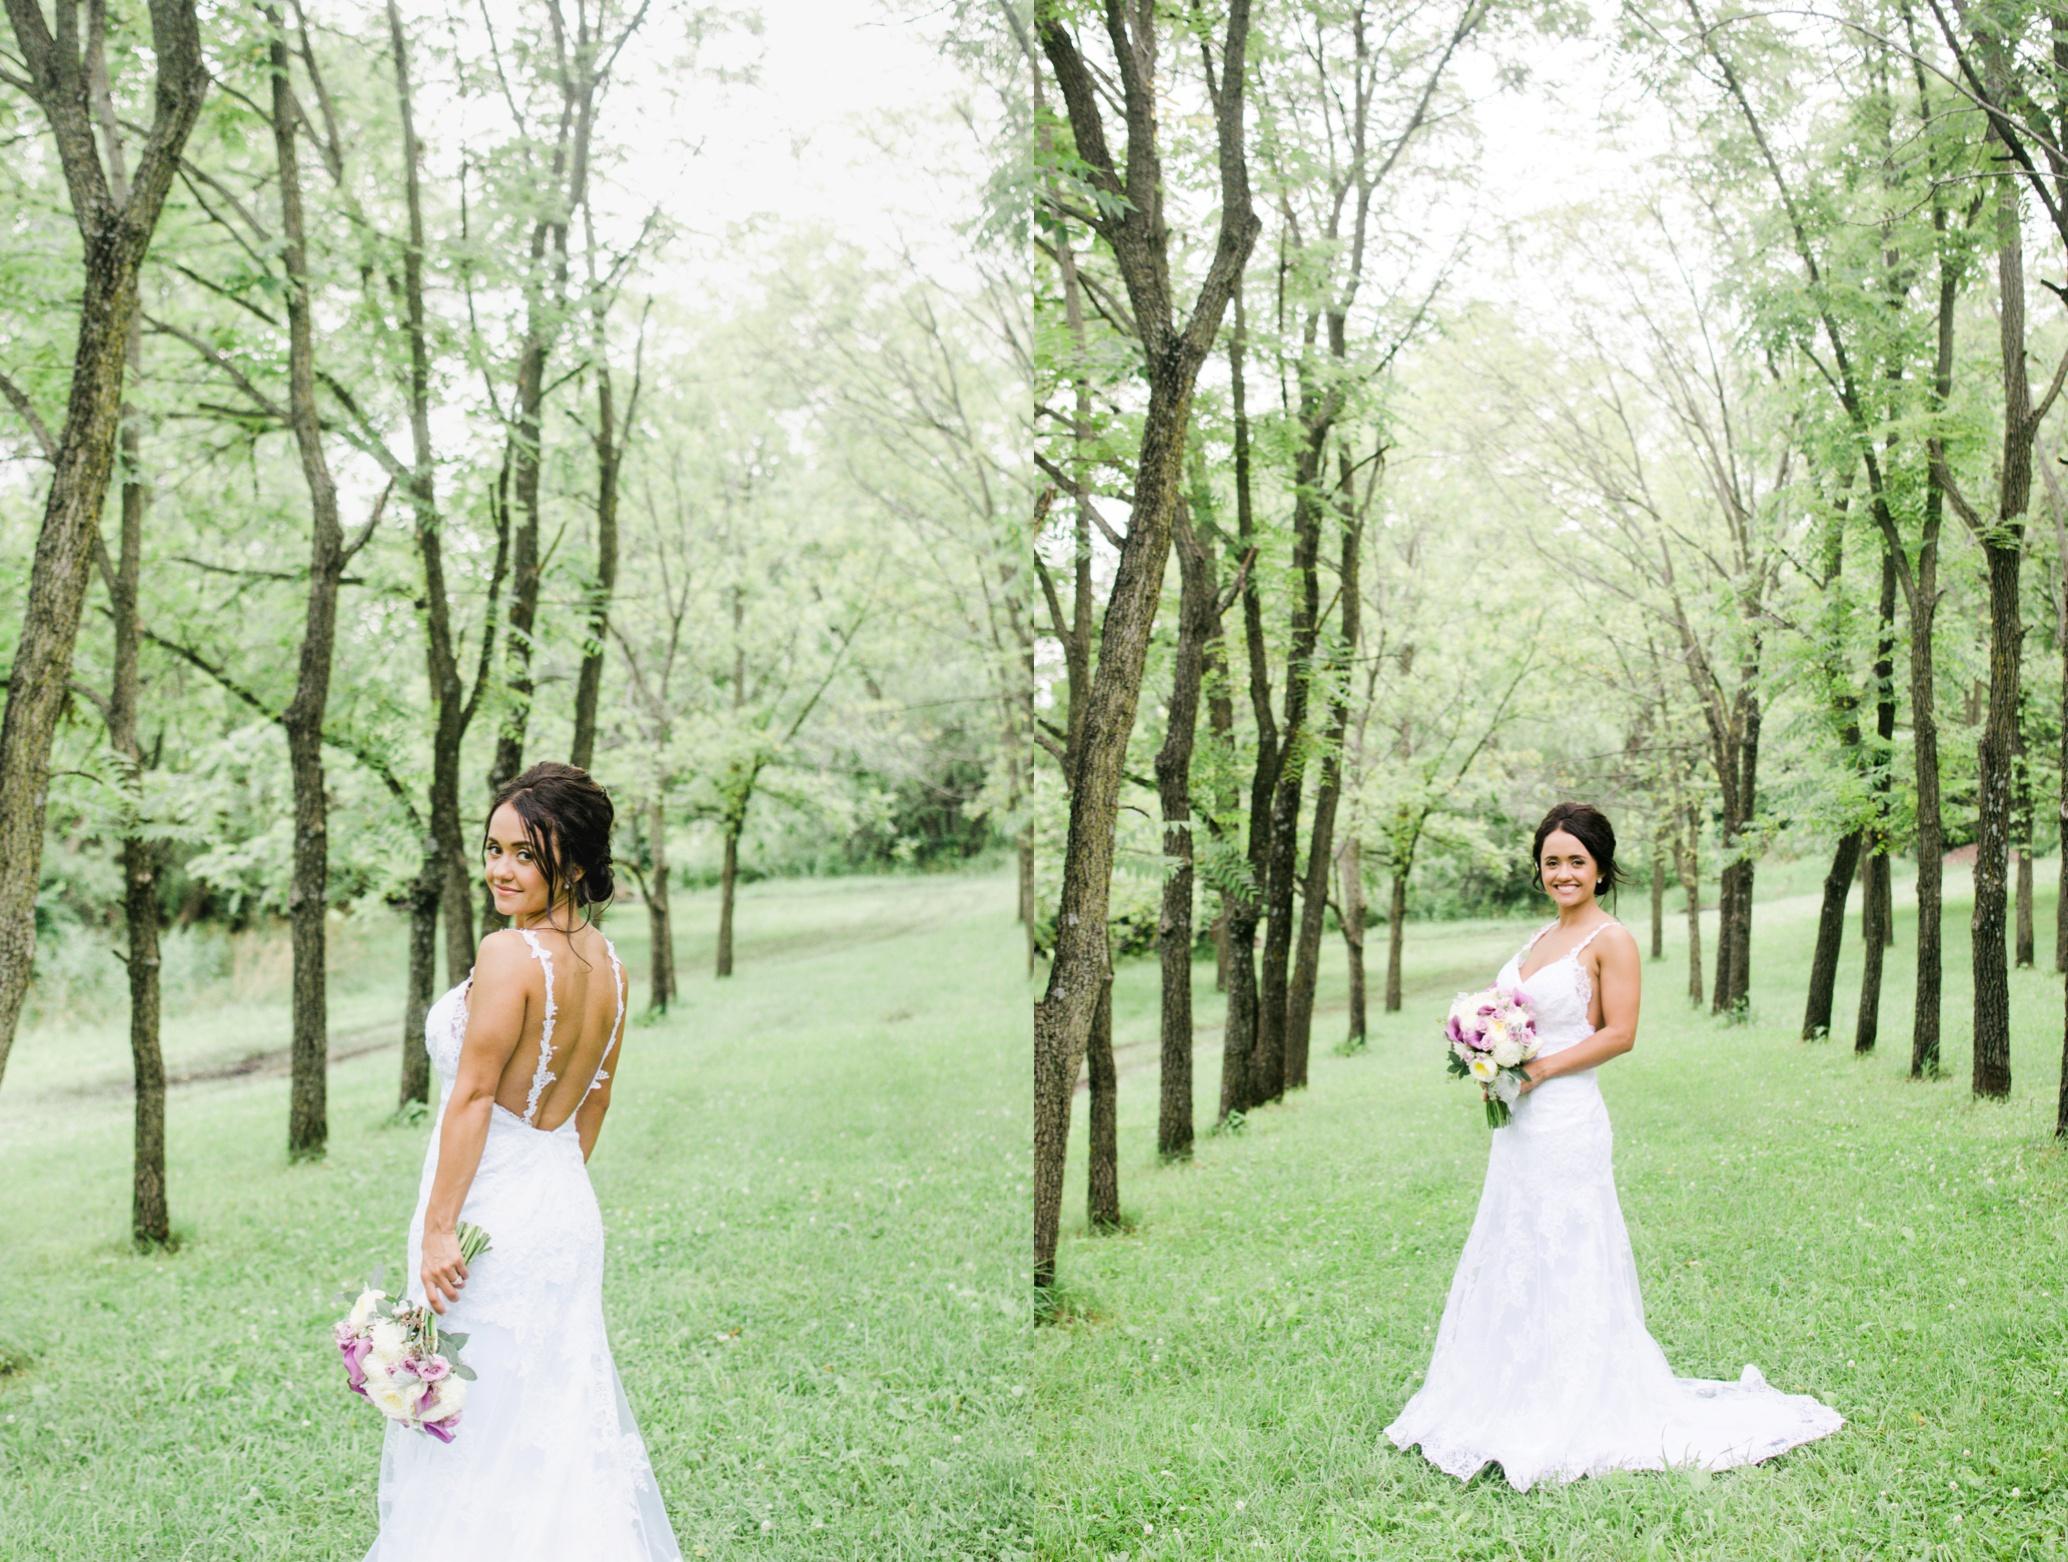 Barnes' Place Rustic Outdoor Wedding | Ali Leigh Photo Minneapolis Wedding Photographer_0159.jpg